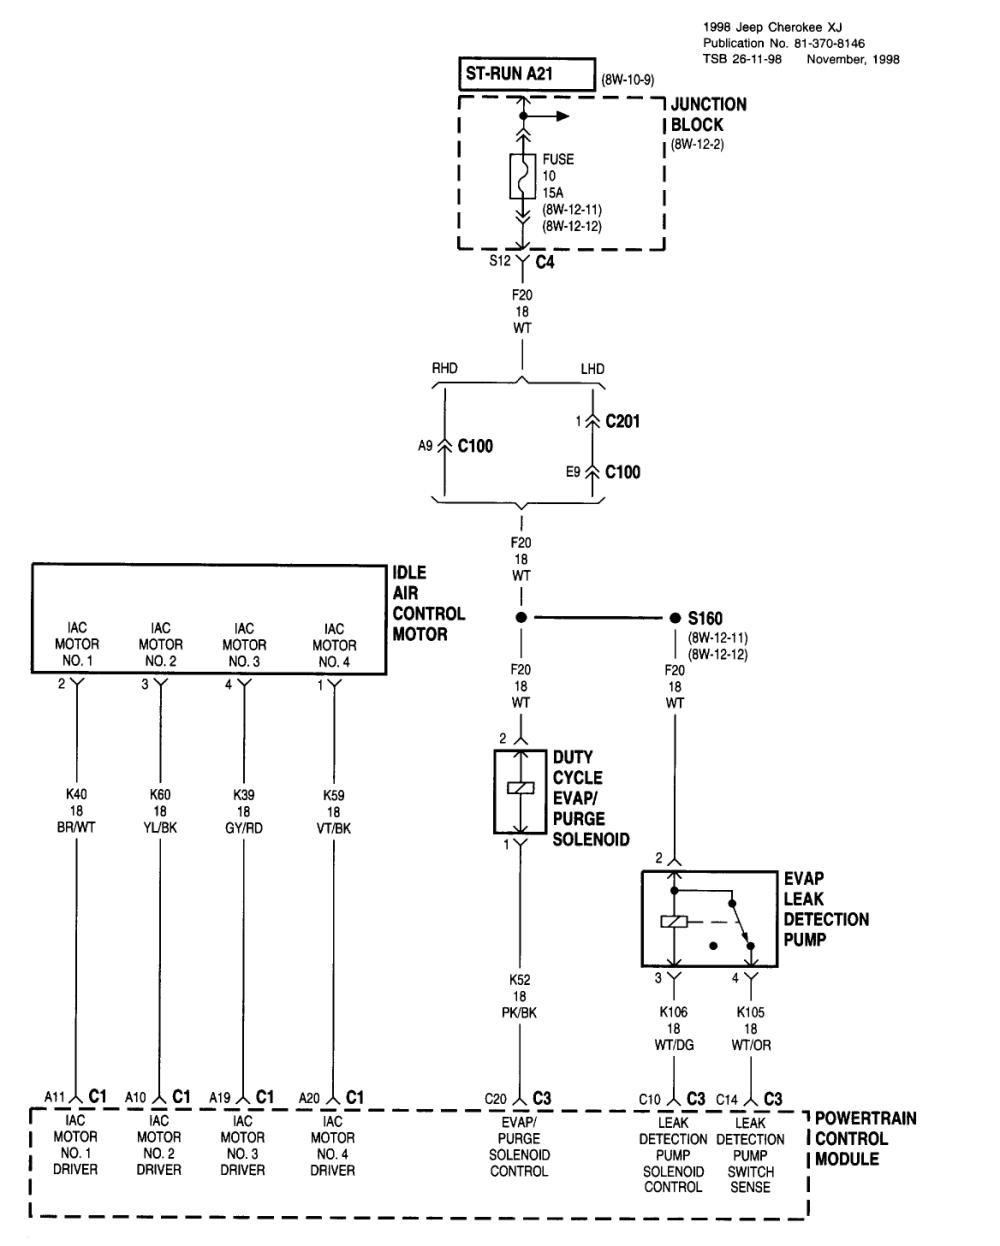 medium resolution of wiring diagram leak detection pump jeep cherokee forum grand am also jeep cherokee xj wiring diagrams besides 2000 jeep